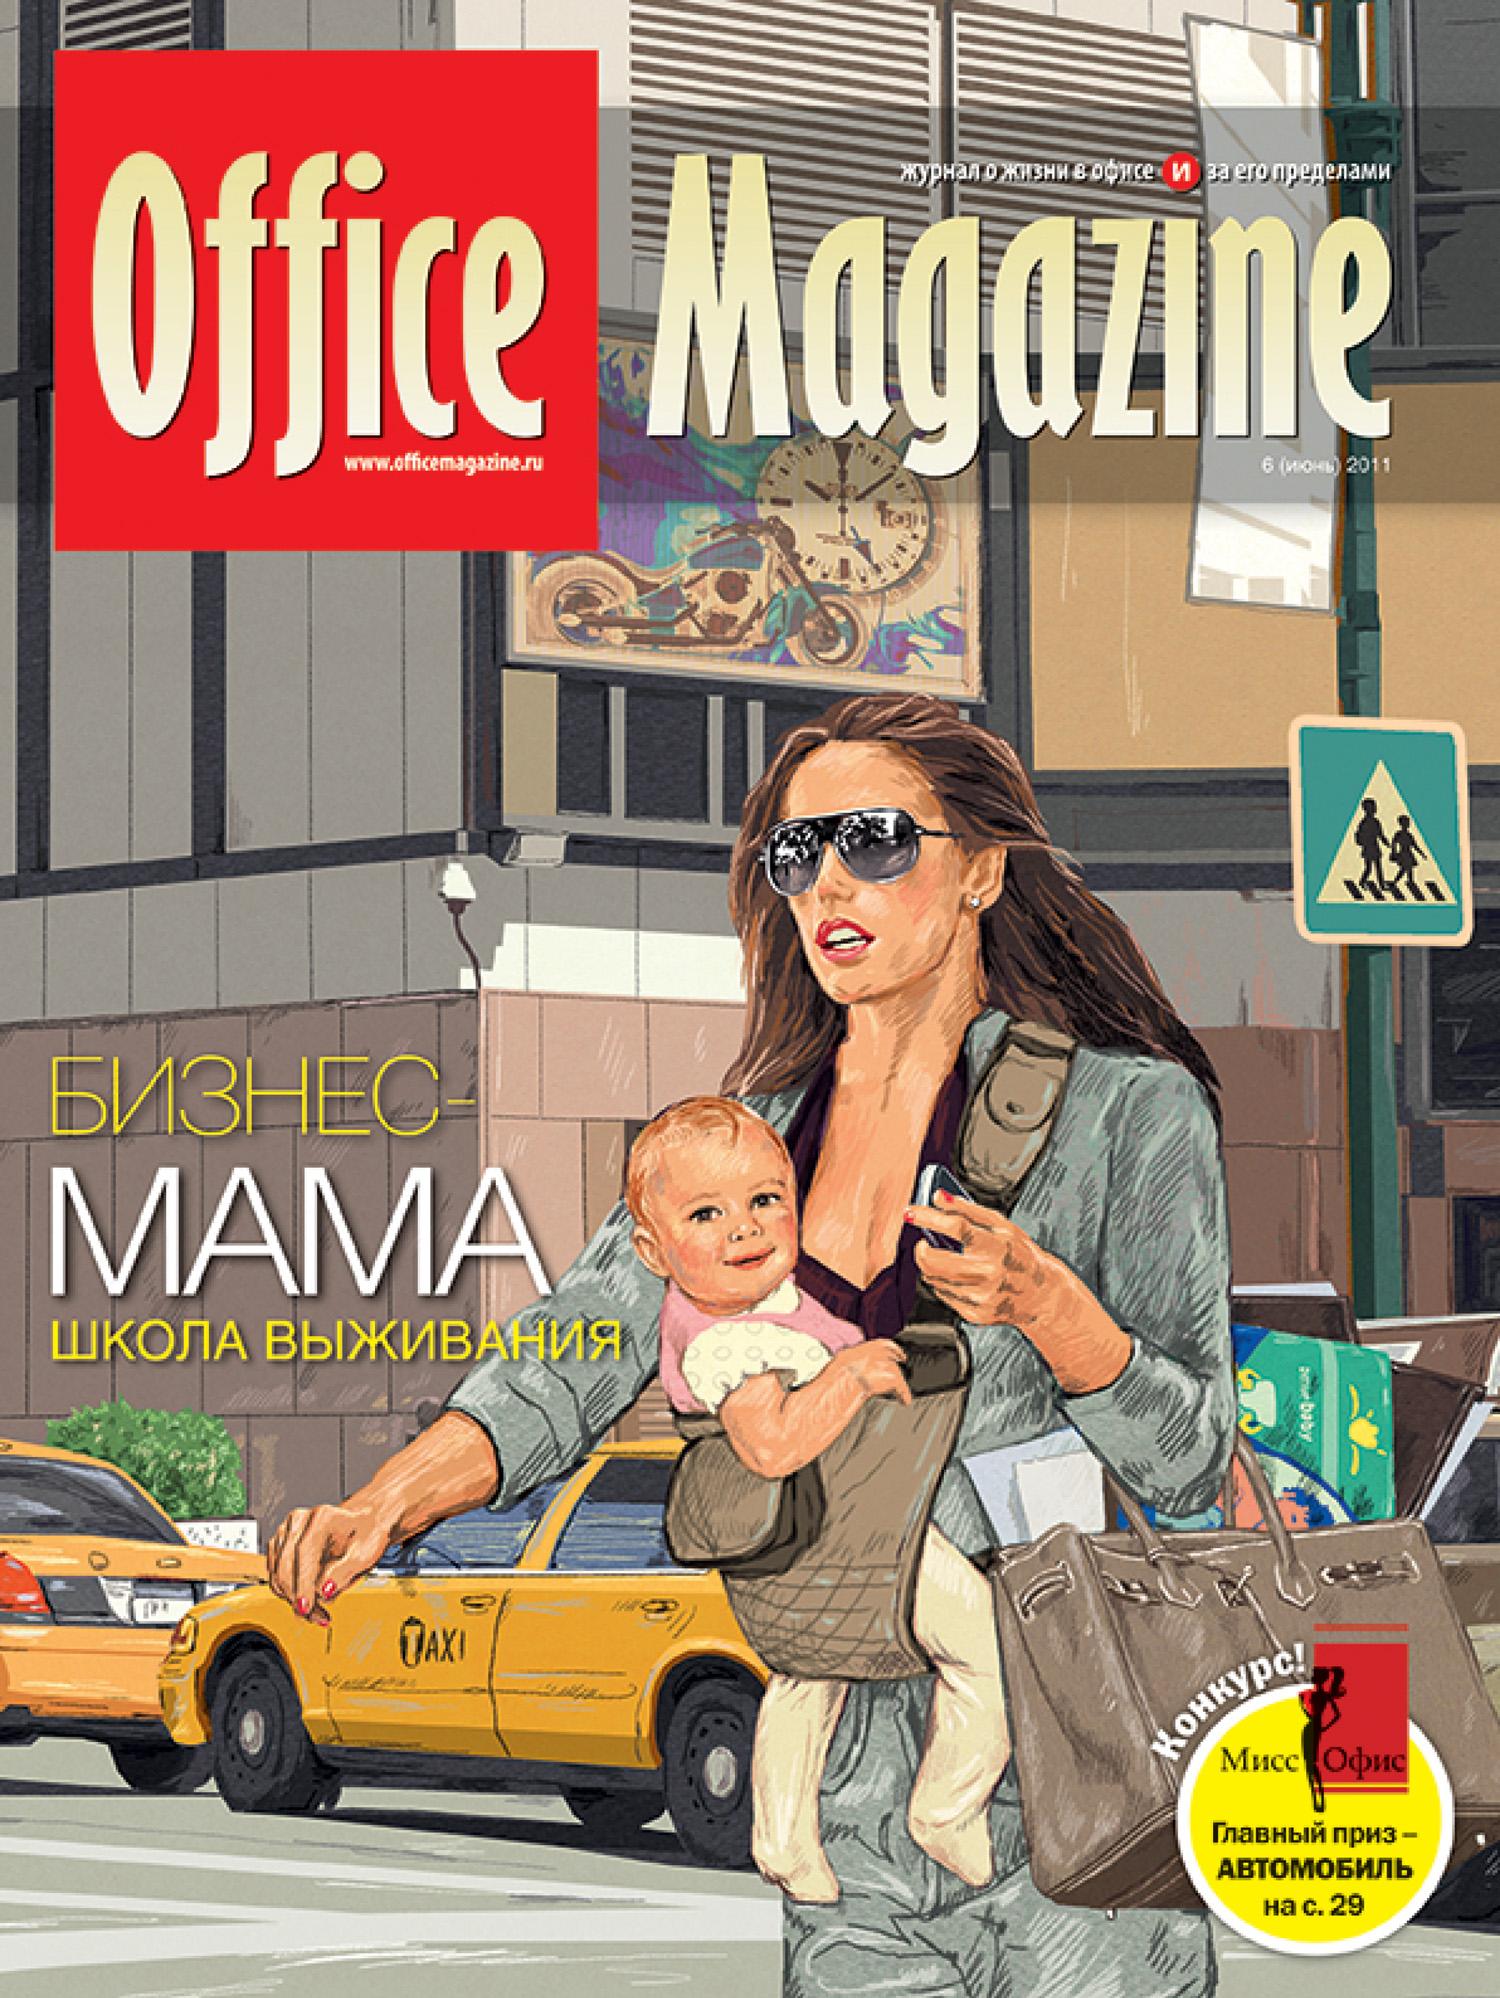 Office Magazine№6 (51) июнь 2011